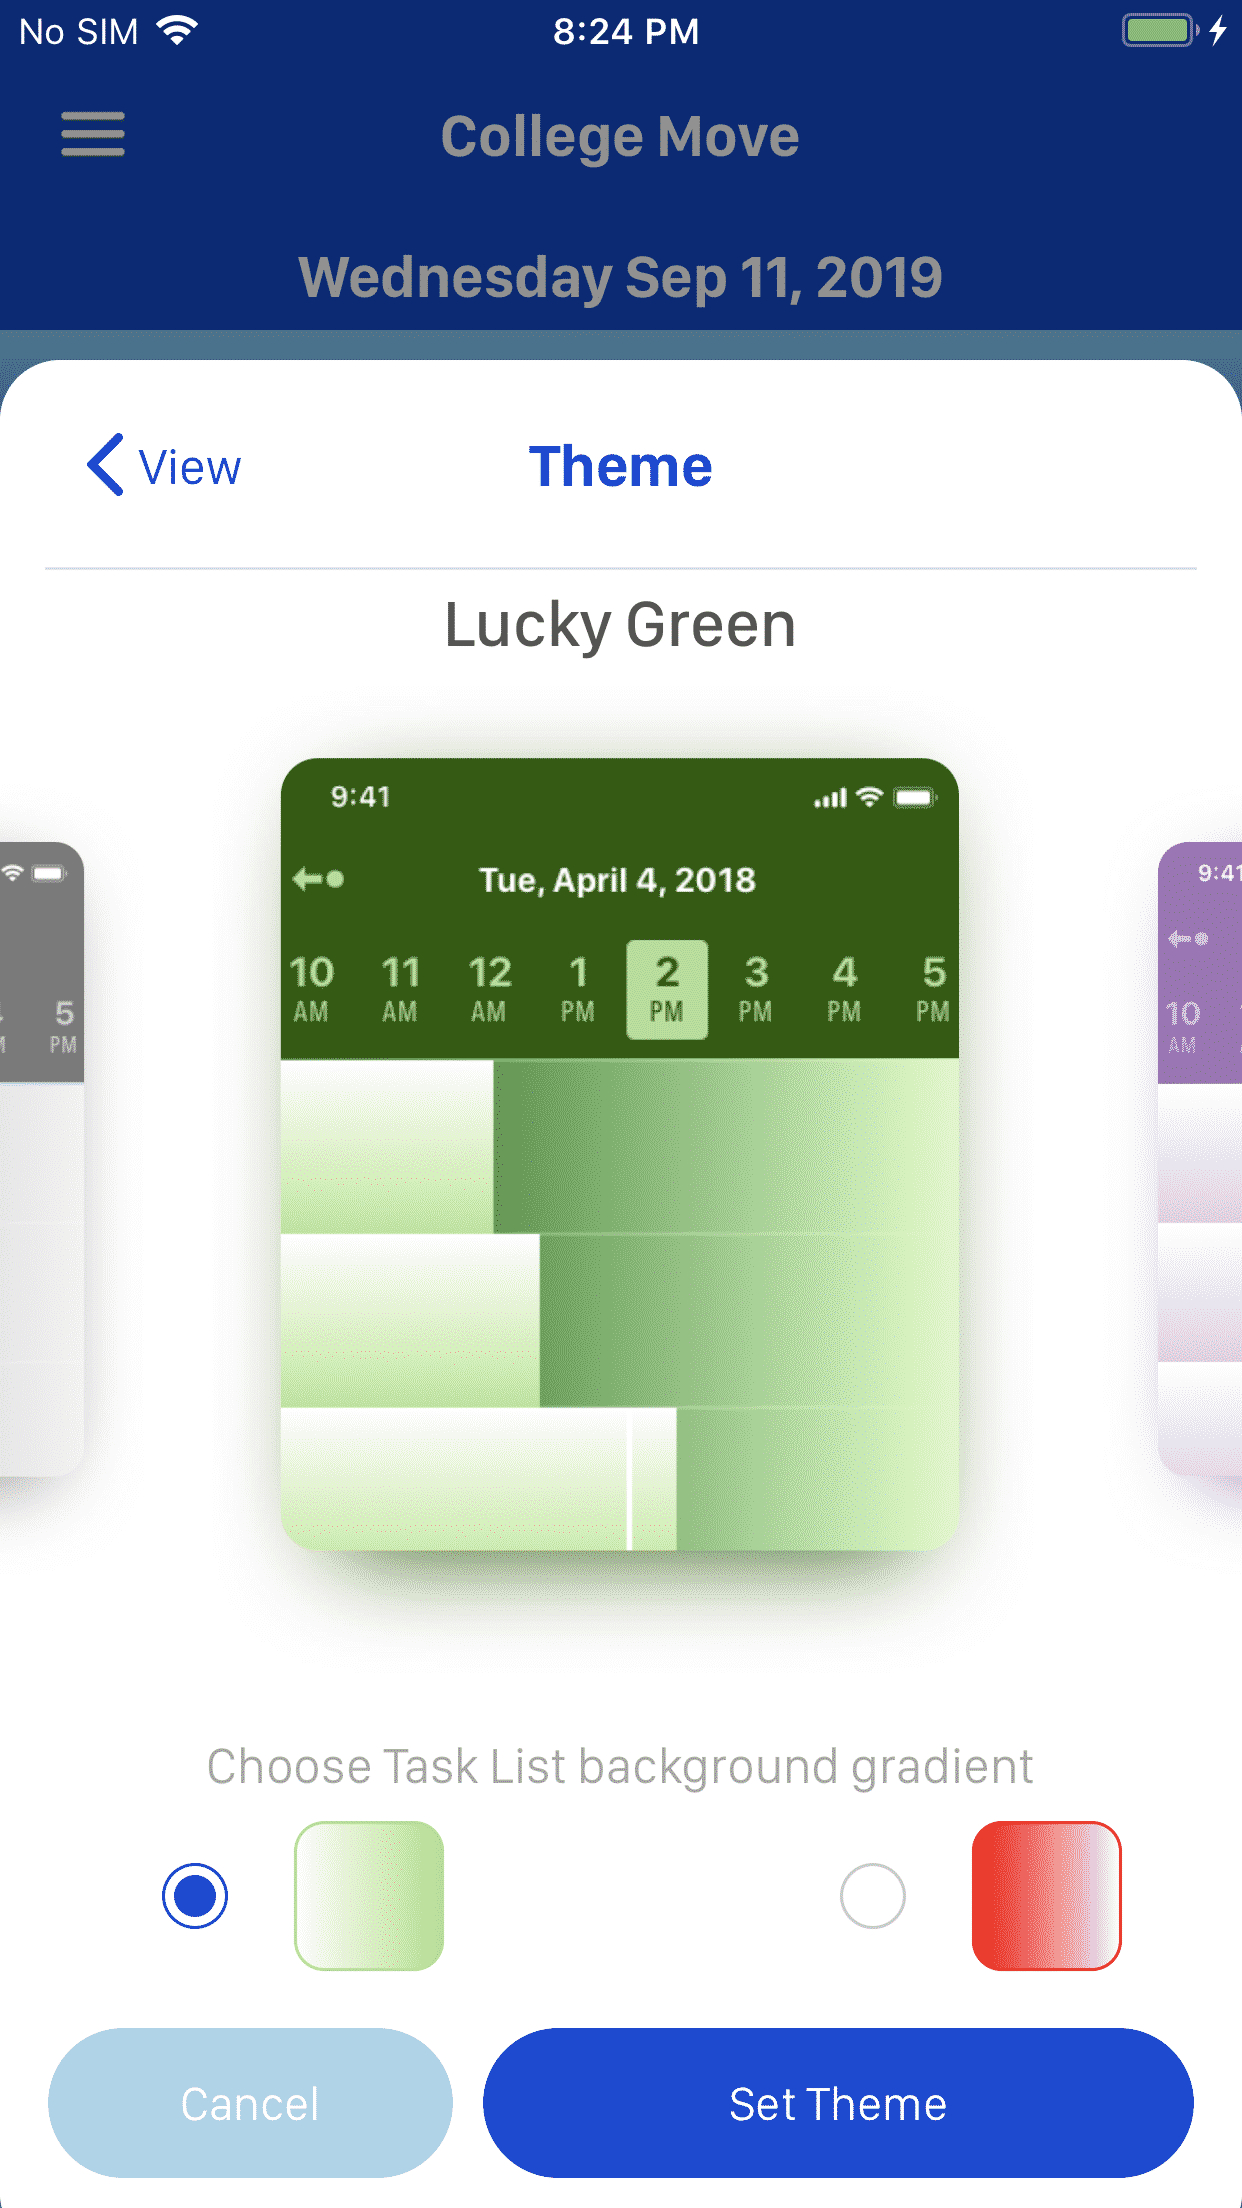 Talendar App  Planner And Calendar App Development   Simpalm within React Native Calendar Agenda